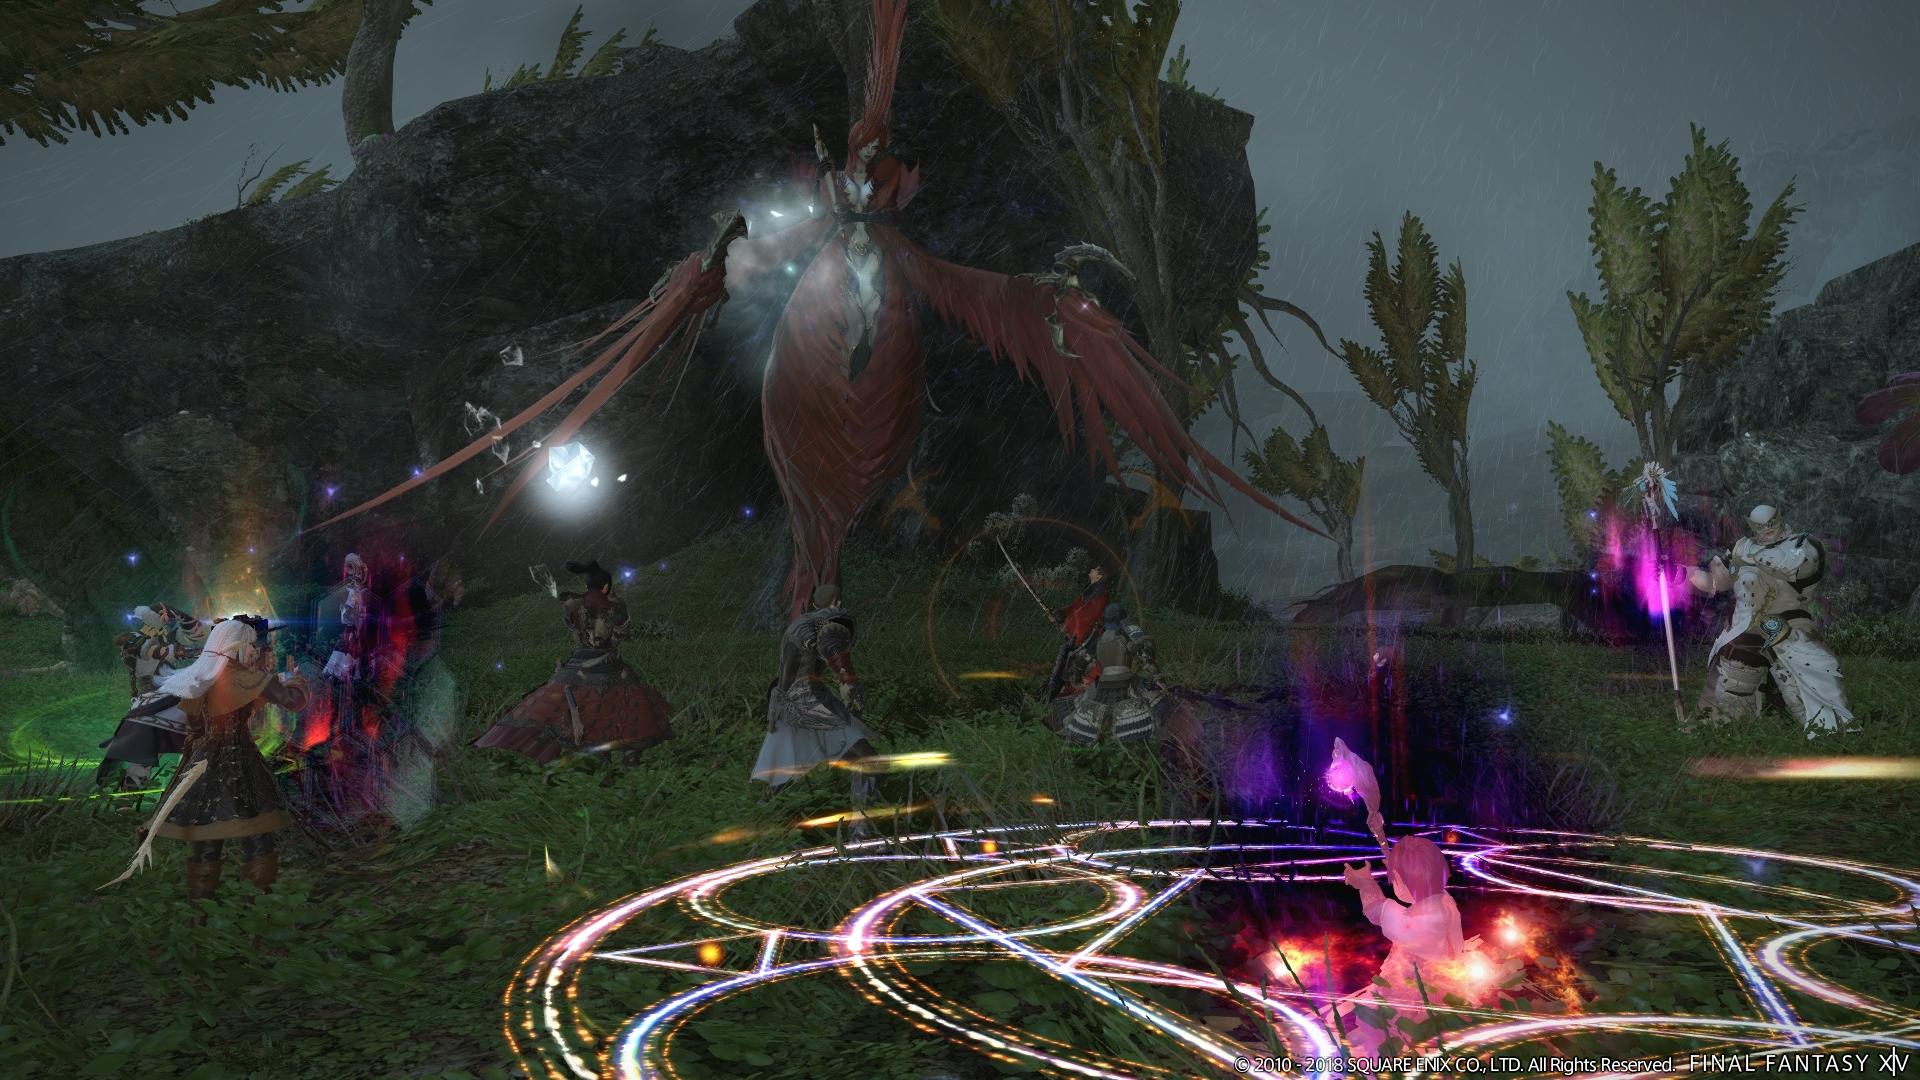 Final Fantasy XIV: Stormblood - Forbidden Land